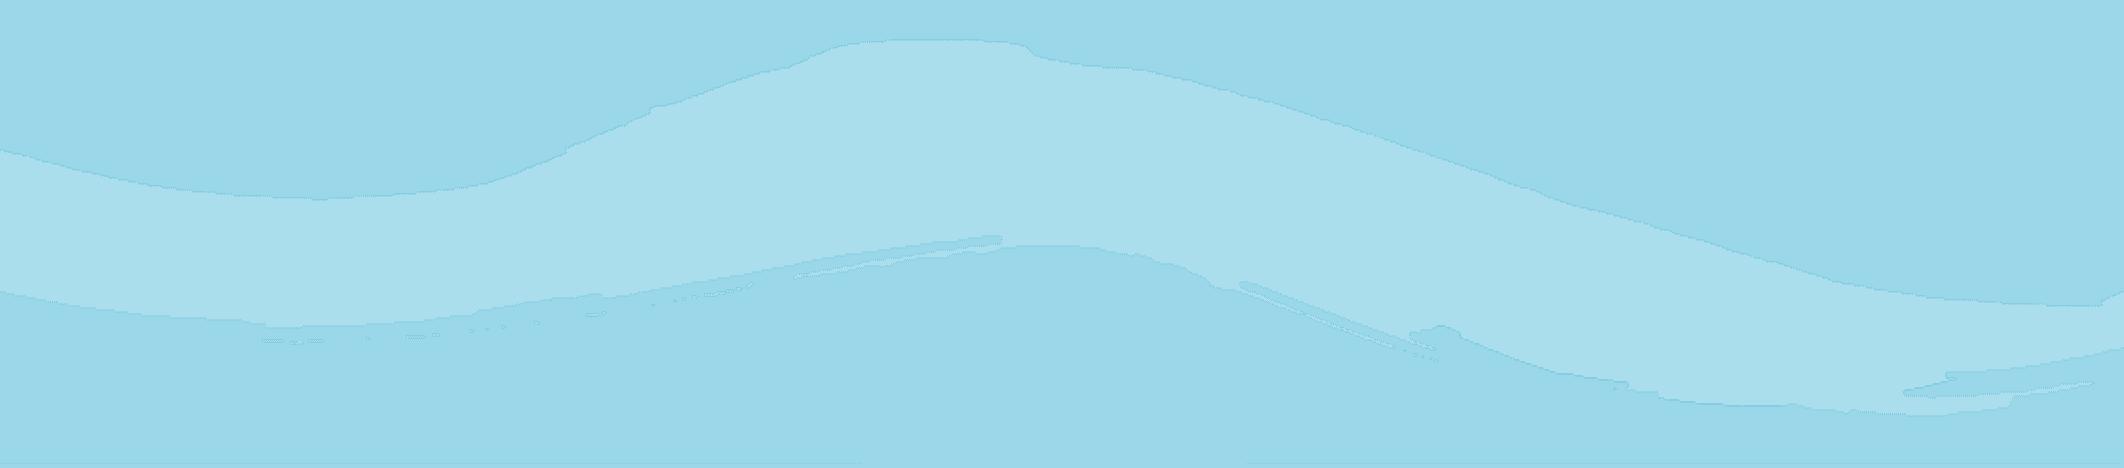 blue swoosh accent image